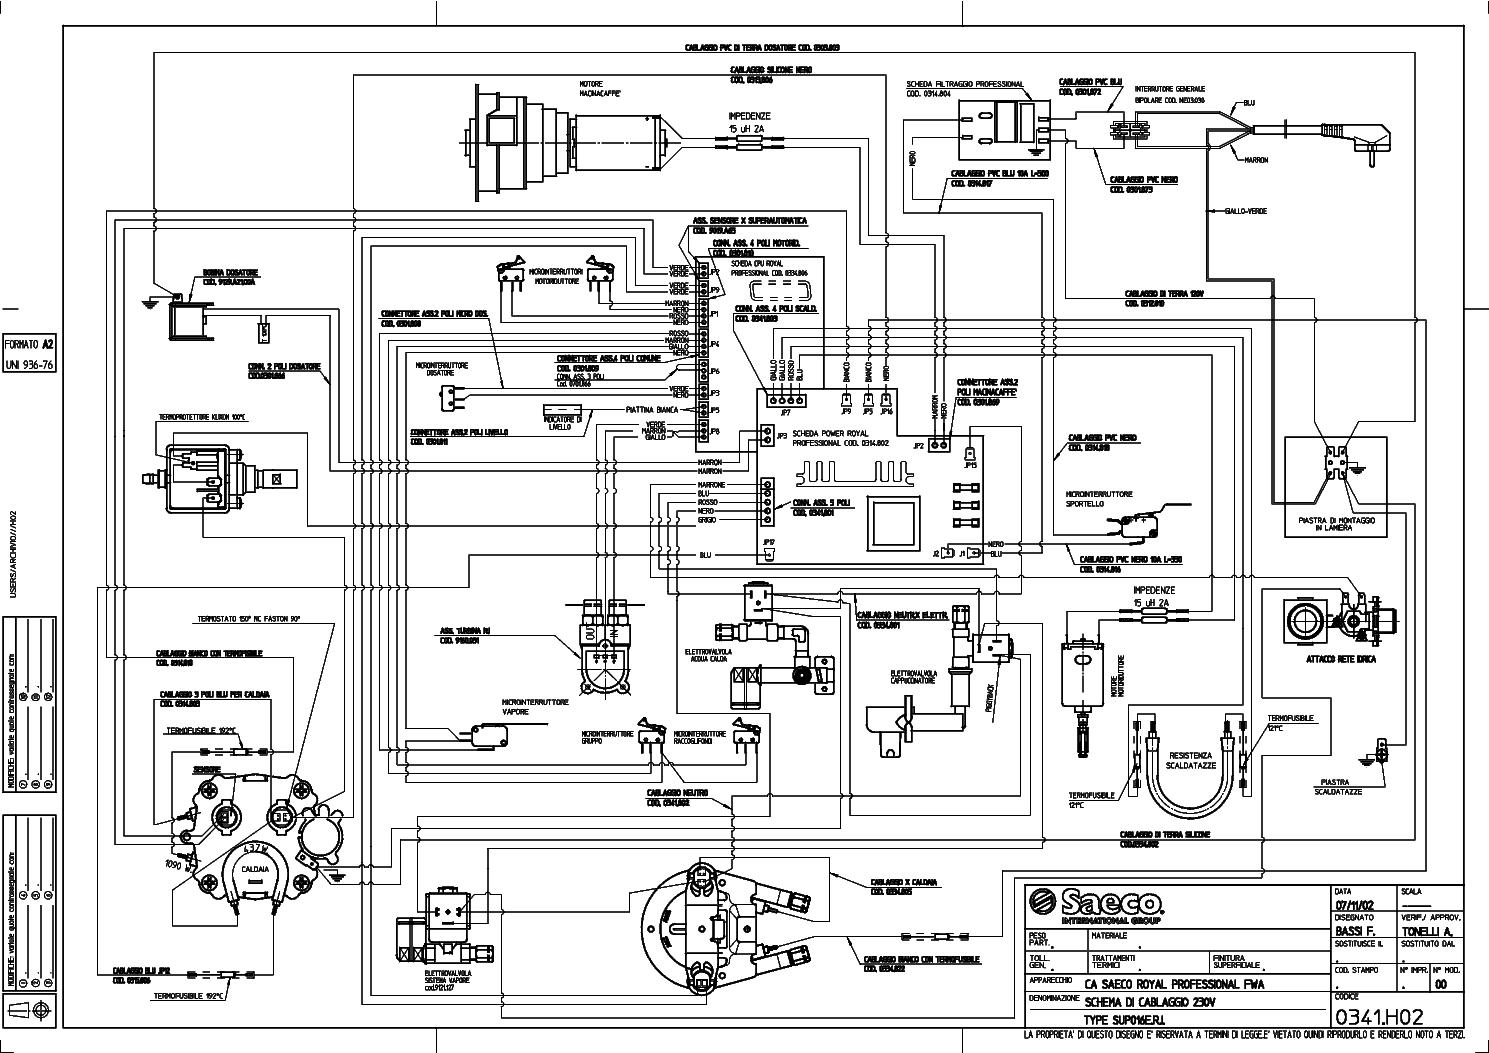 saeco royal coffee bar service manual download  schematics